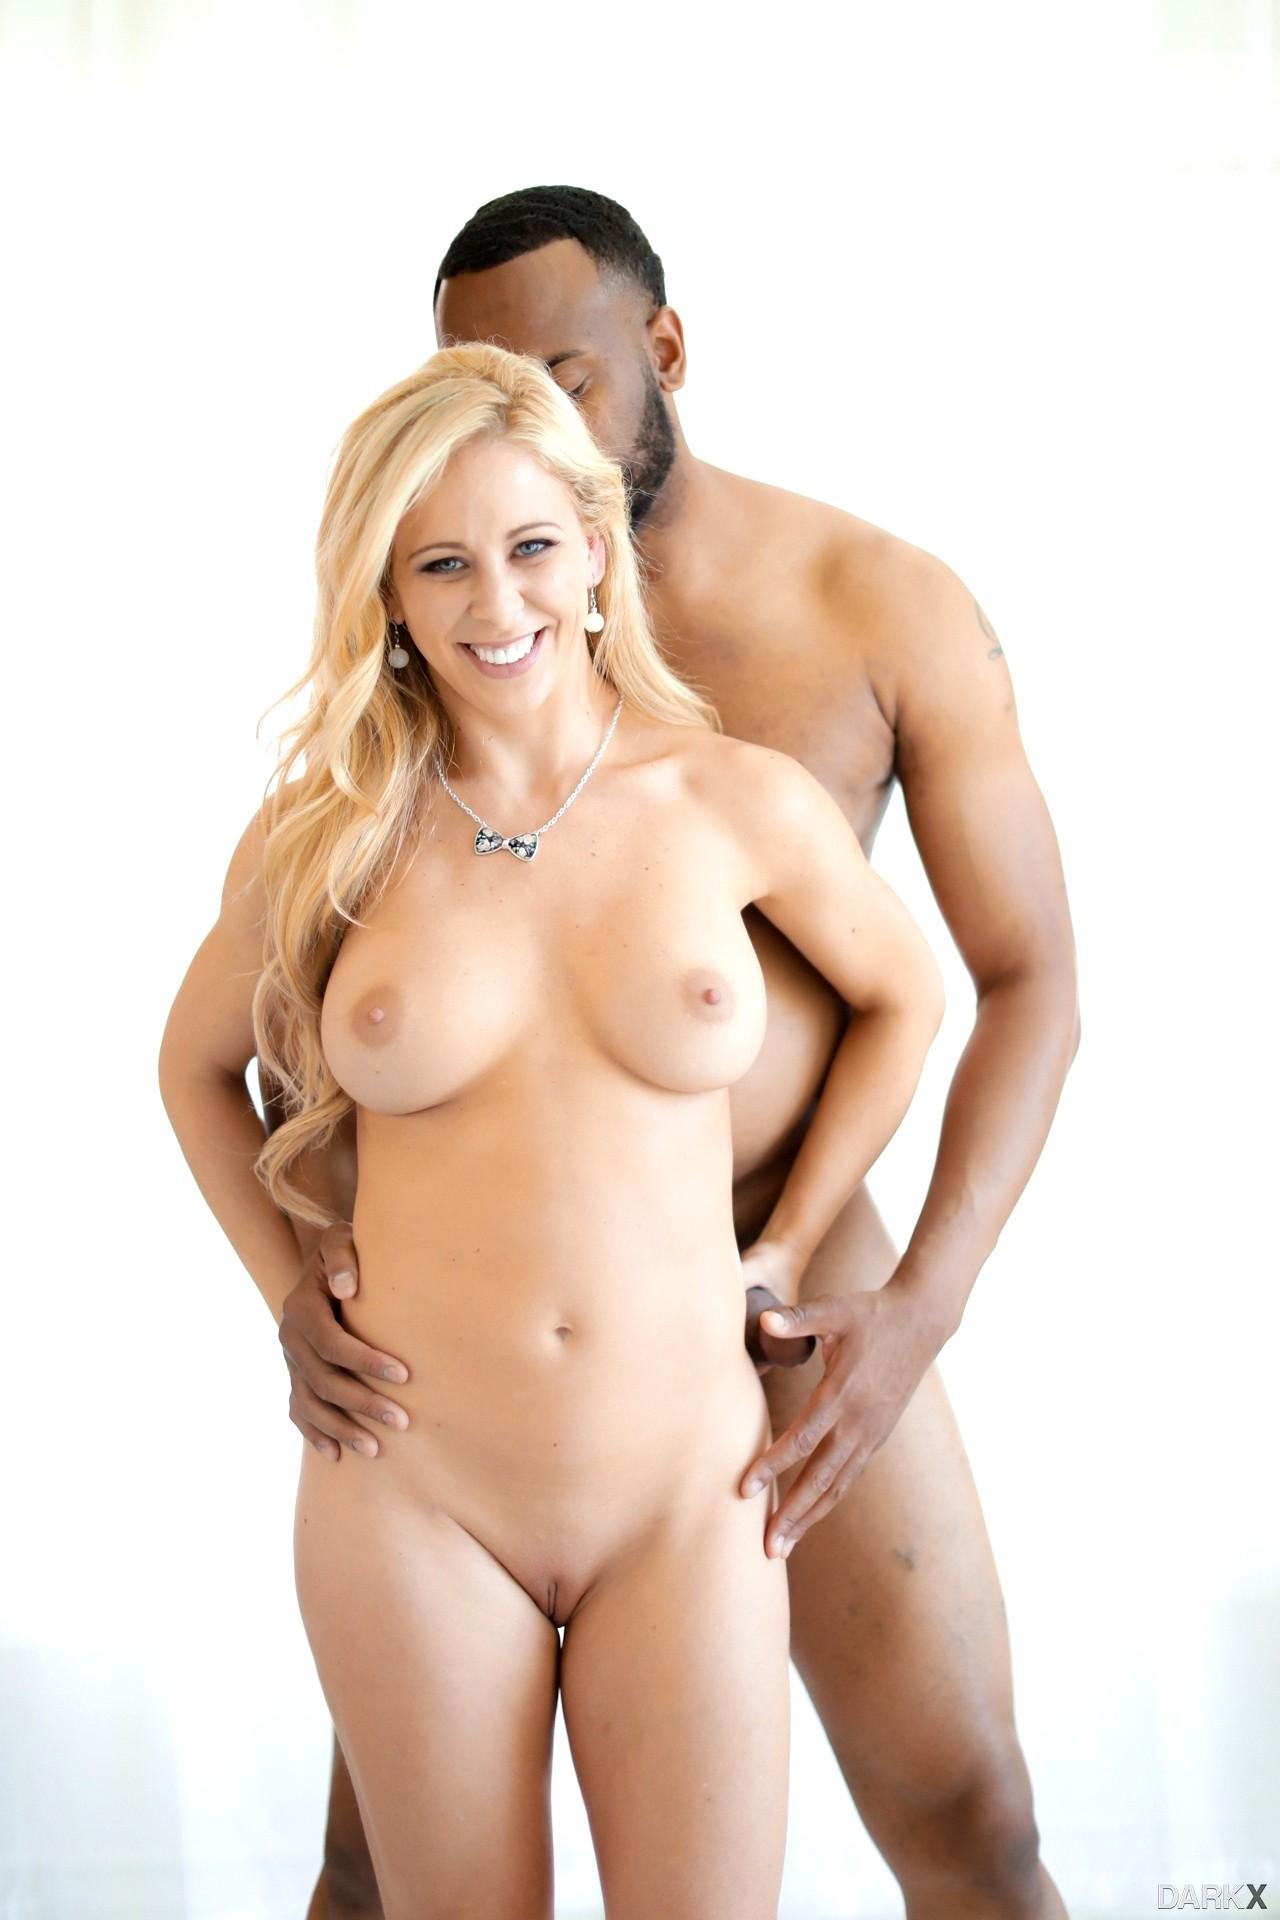 Darkx Cherie Deville Crazy Big Tits Porn Woman Sex Hd Pics-4596